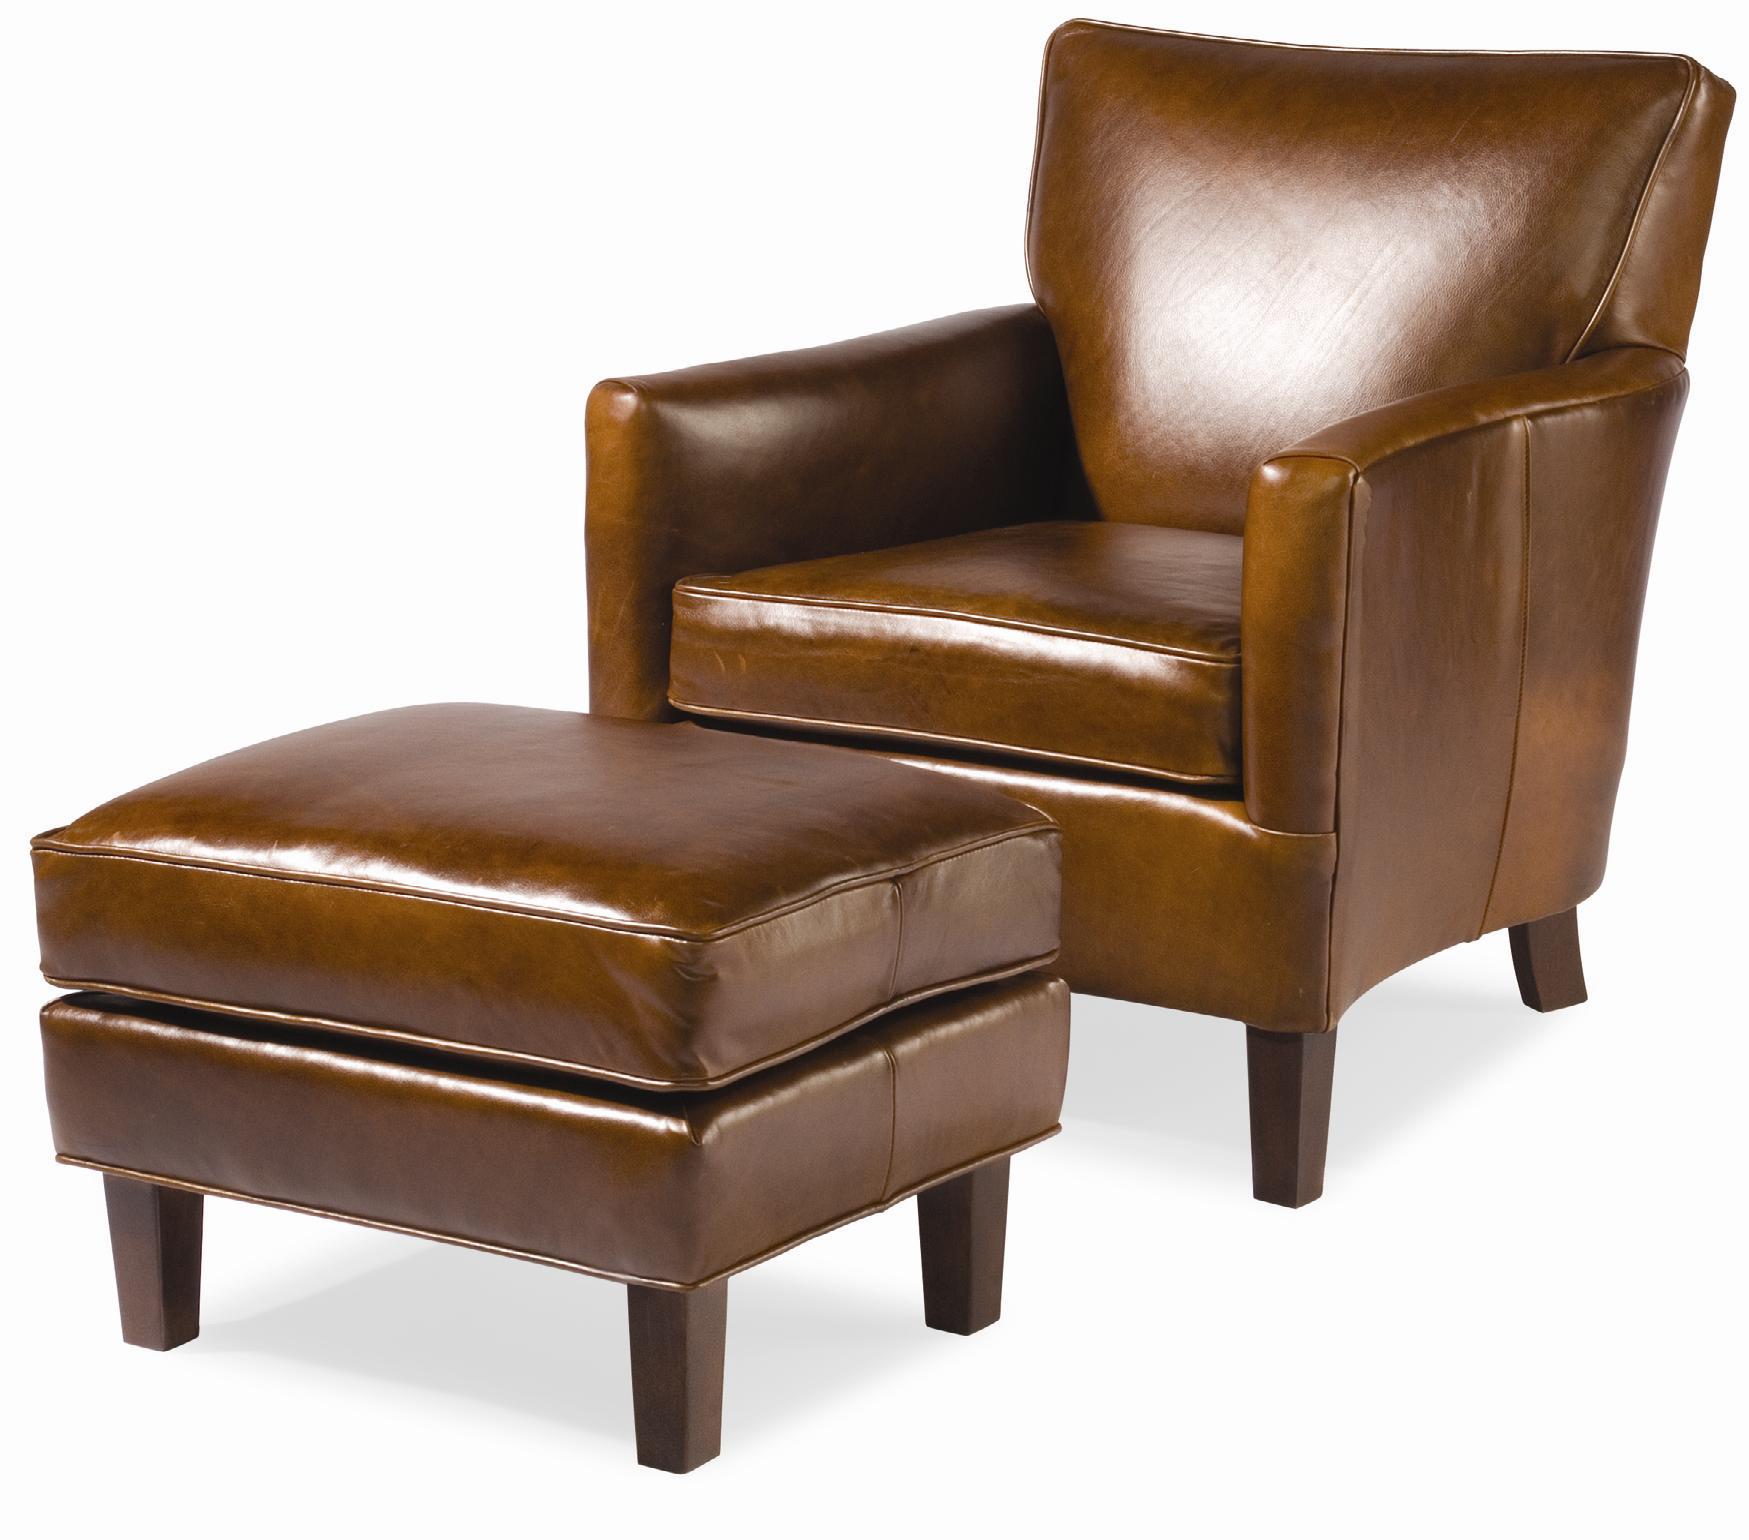 Exceptional Sam Moore NigelClub Chair; Sam Moore NigelClub Chair